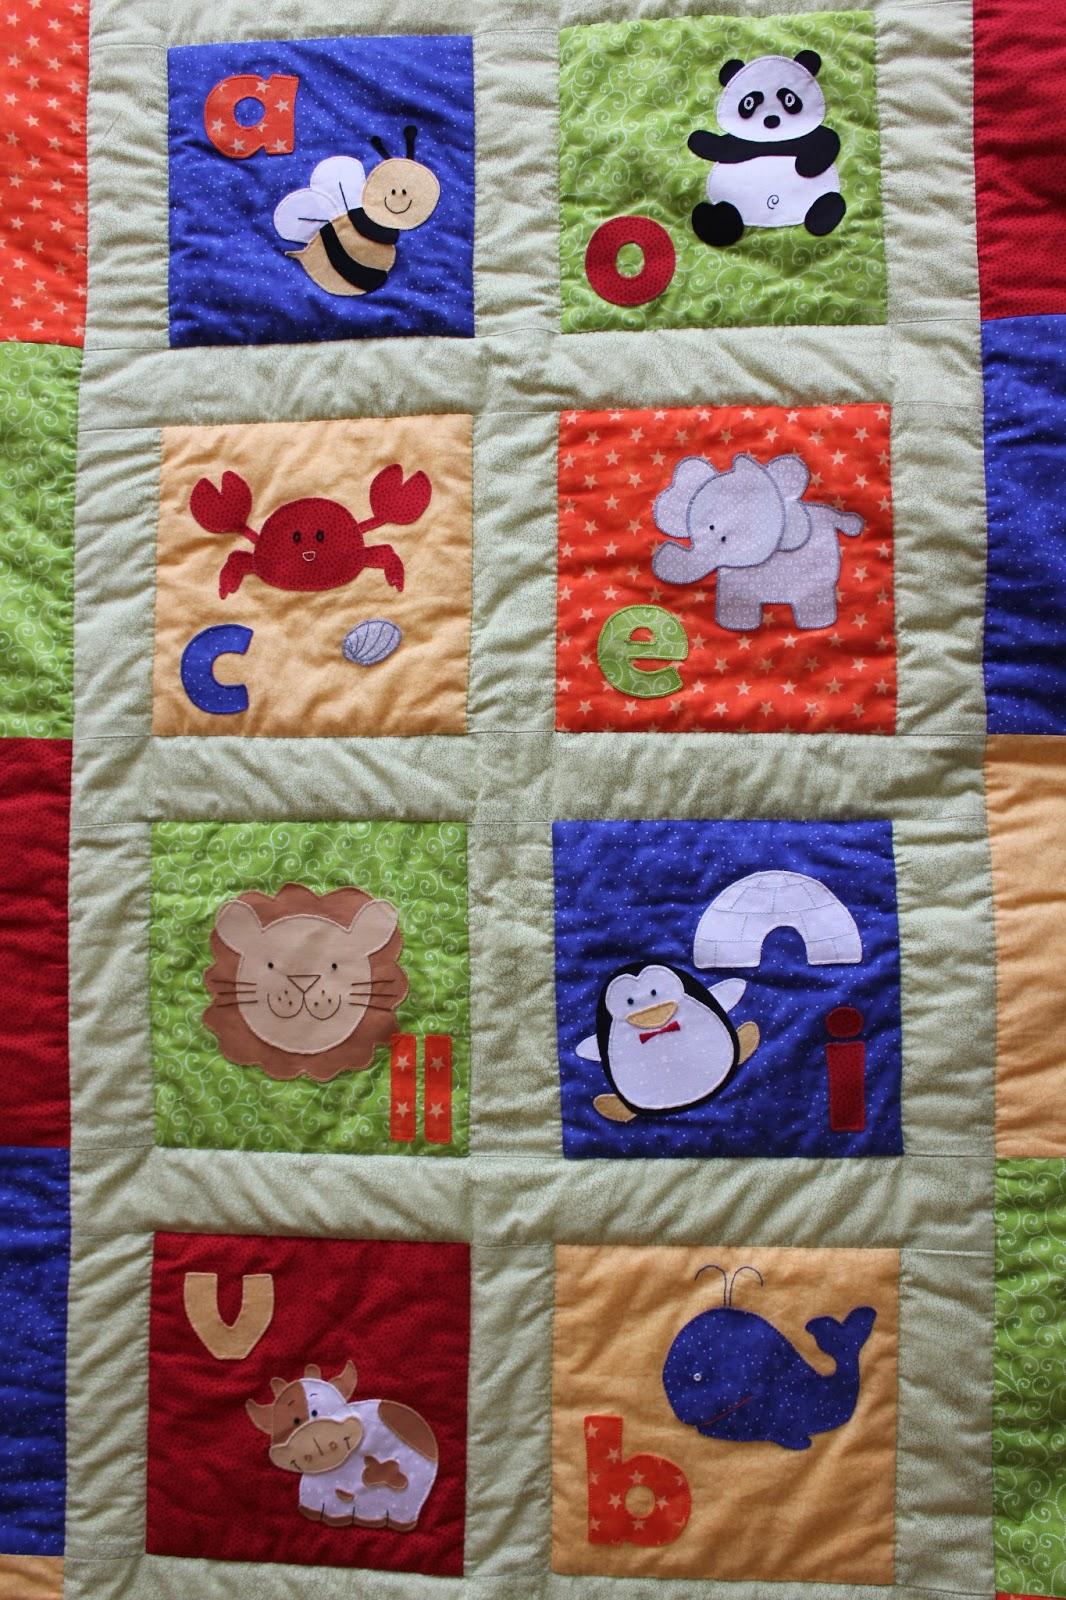 Mi hogar de patchwork colcha para bebe de patchwork - Patrones para colchas de patchwork ...